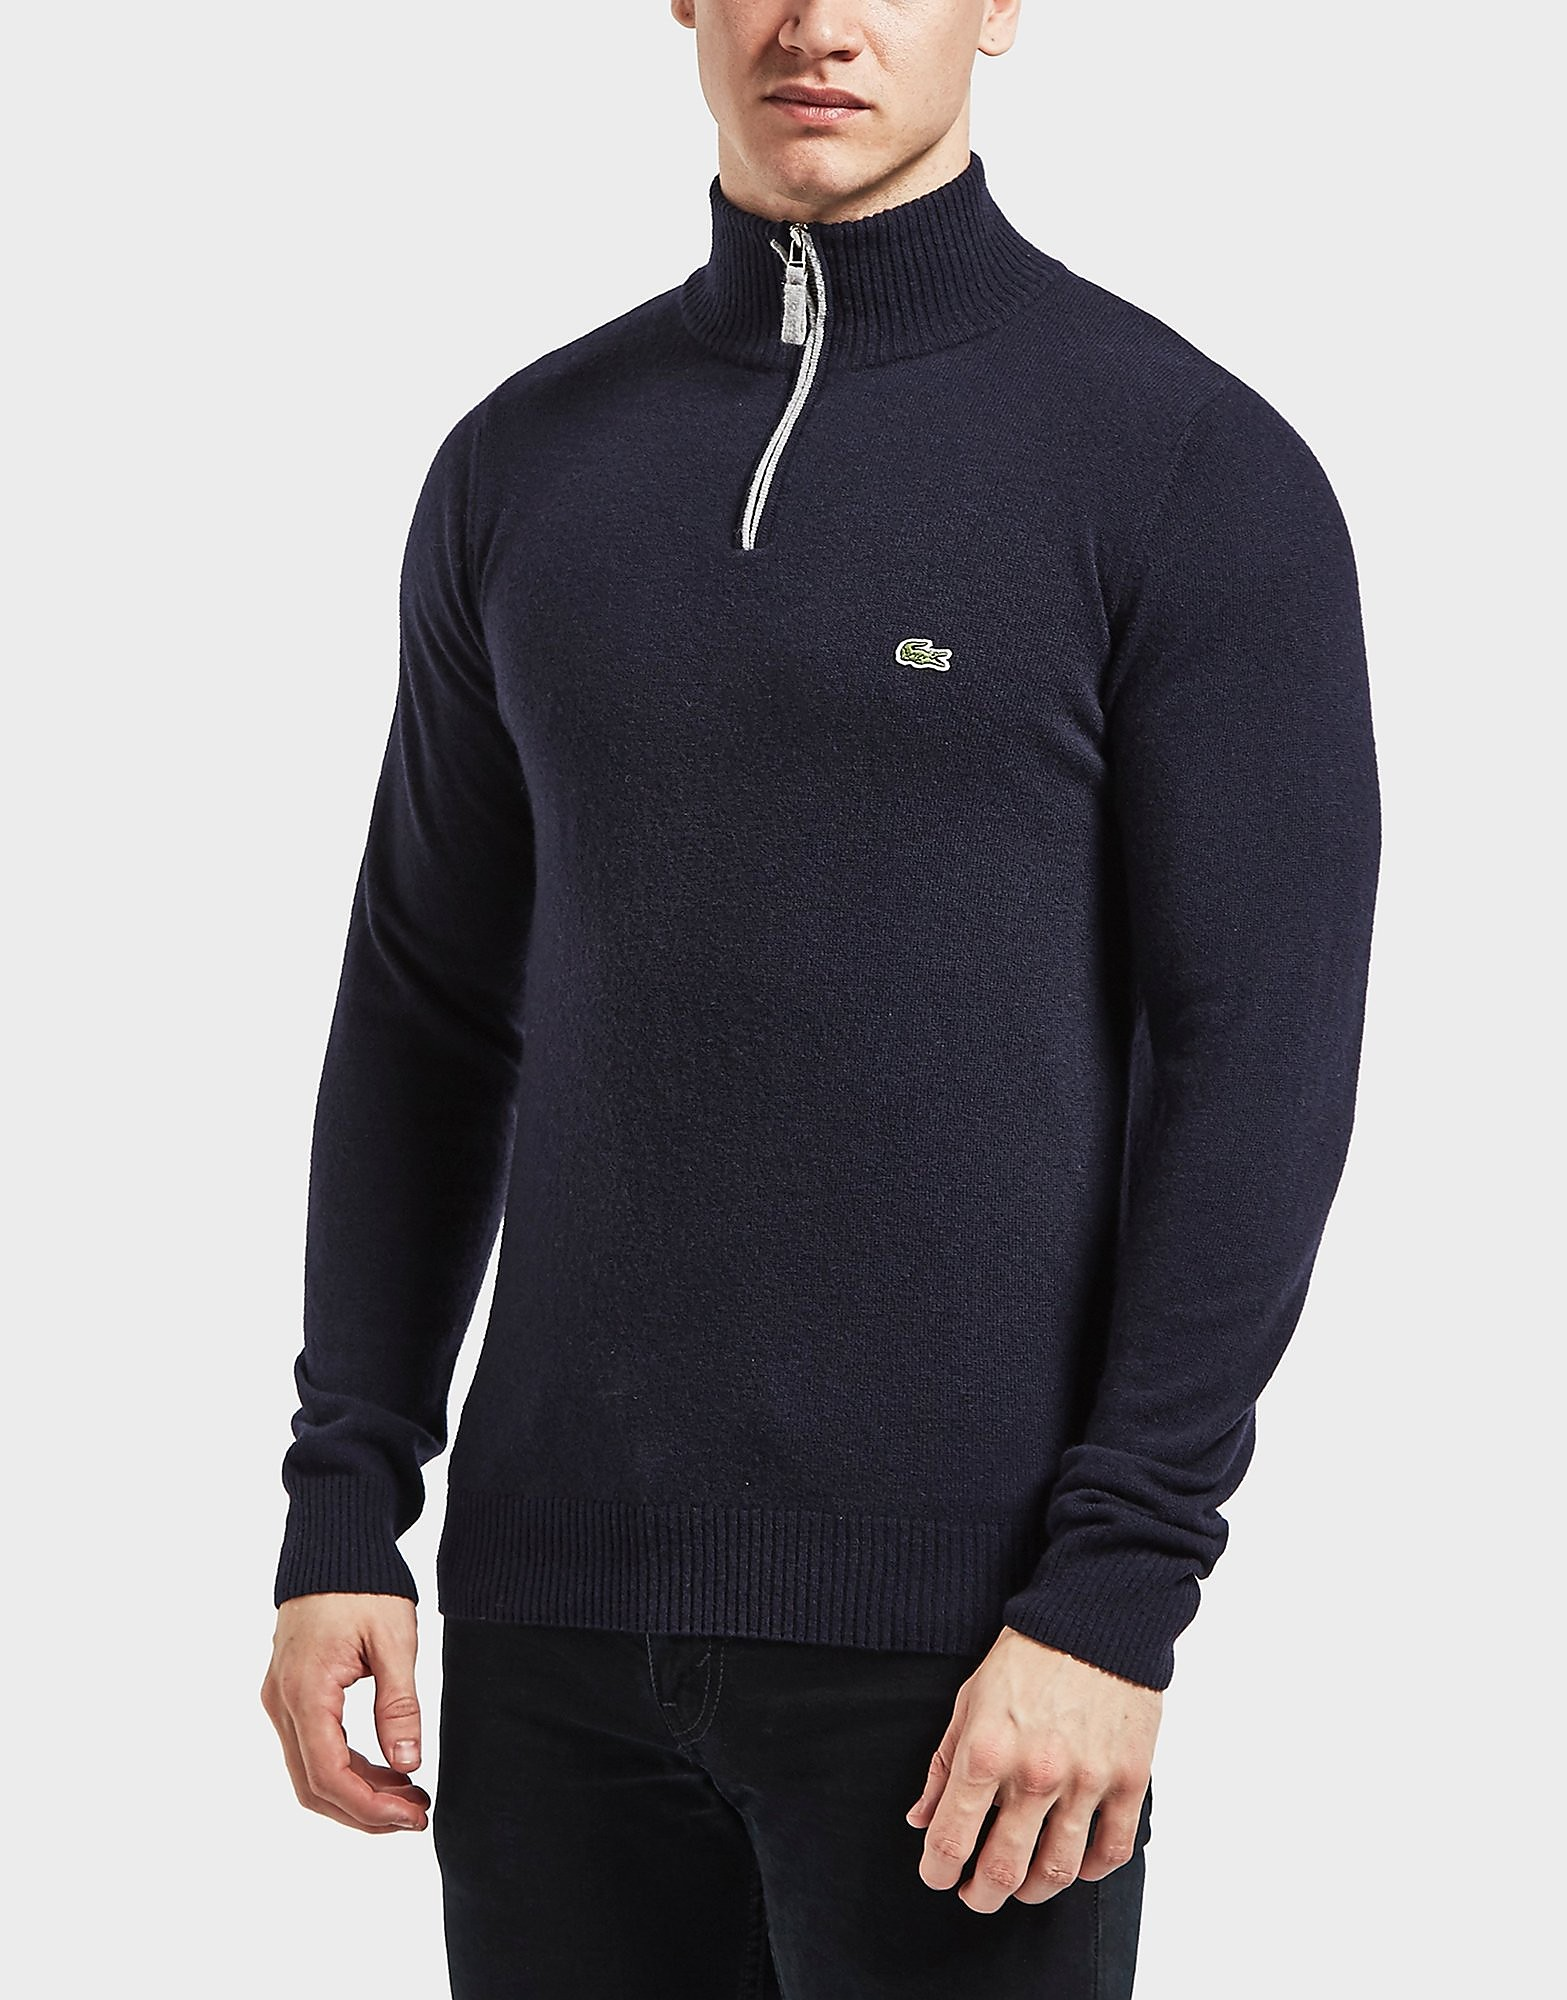 Lacoste Knitted Half Zip Jumper